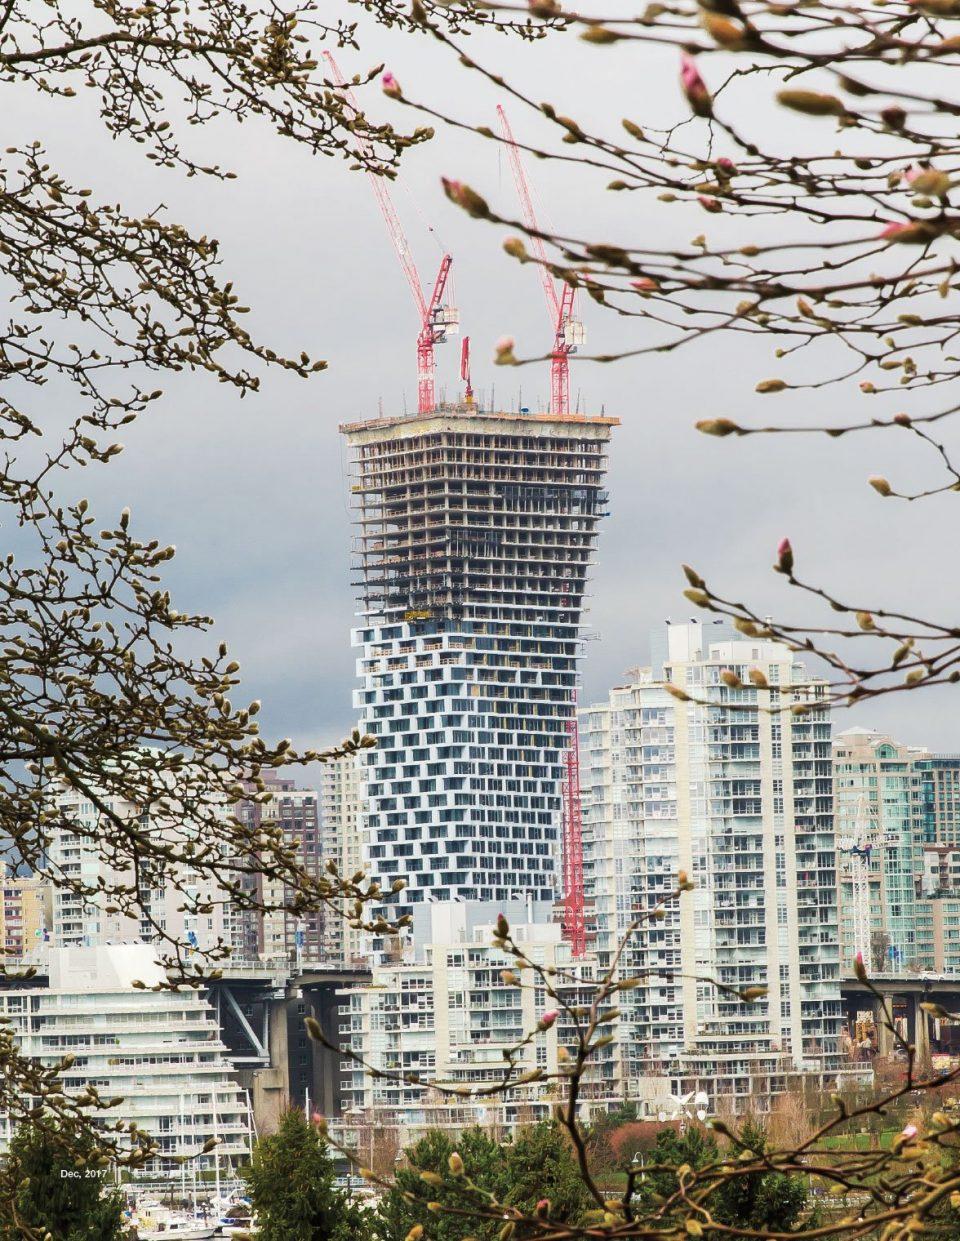 Vancouver House construction 2018